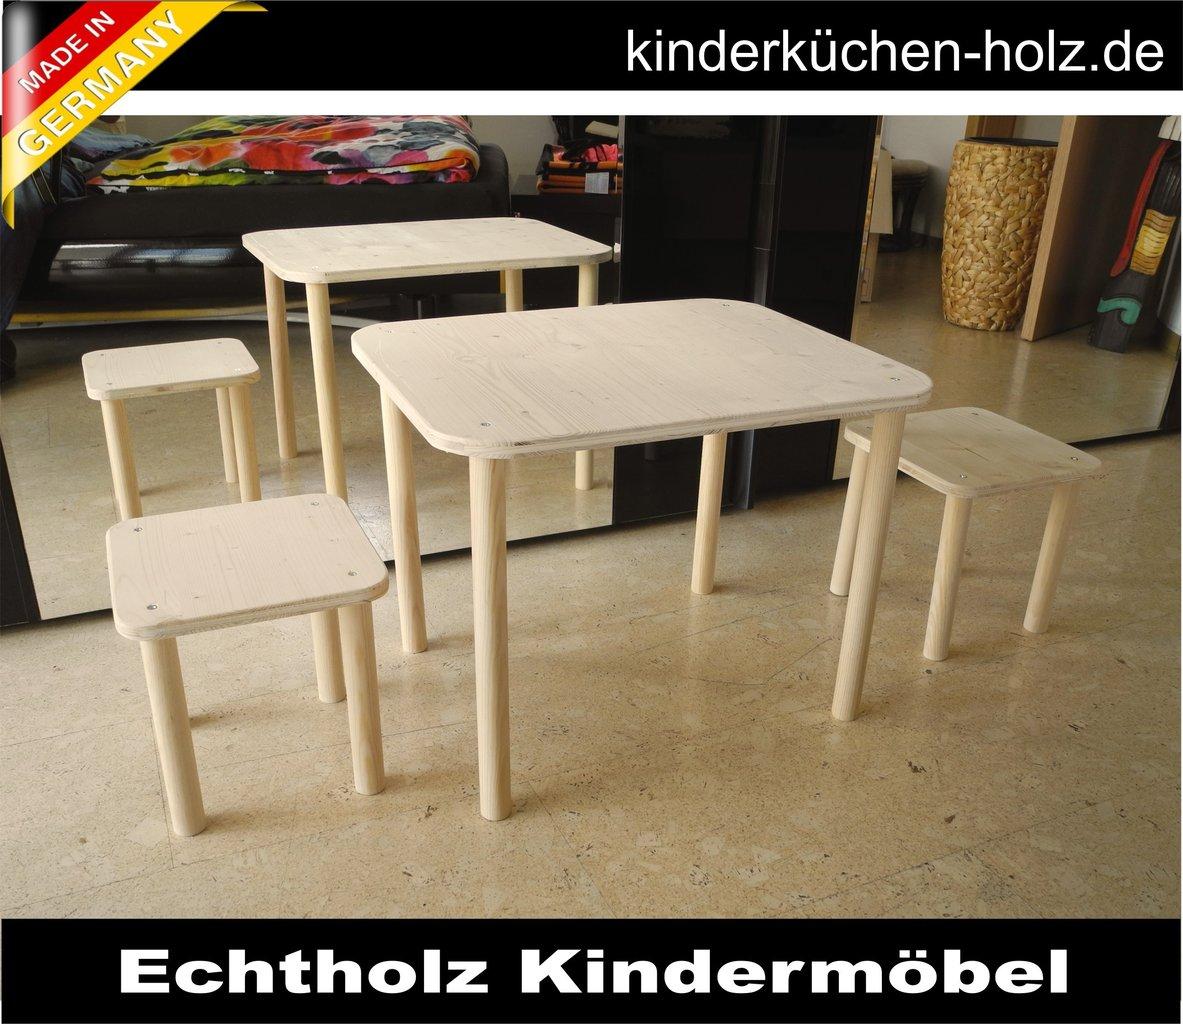 Kinderm bel set 1 tisch und zwei st hle aus echtholz for Kindermobel set